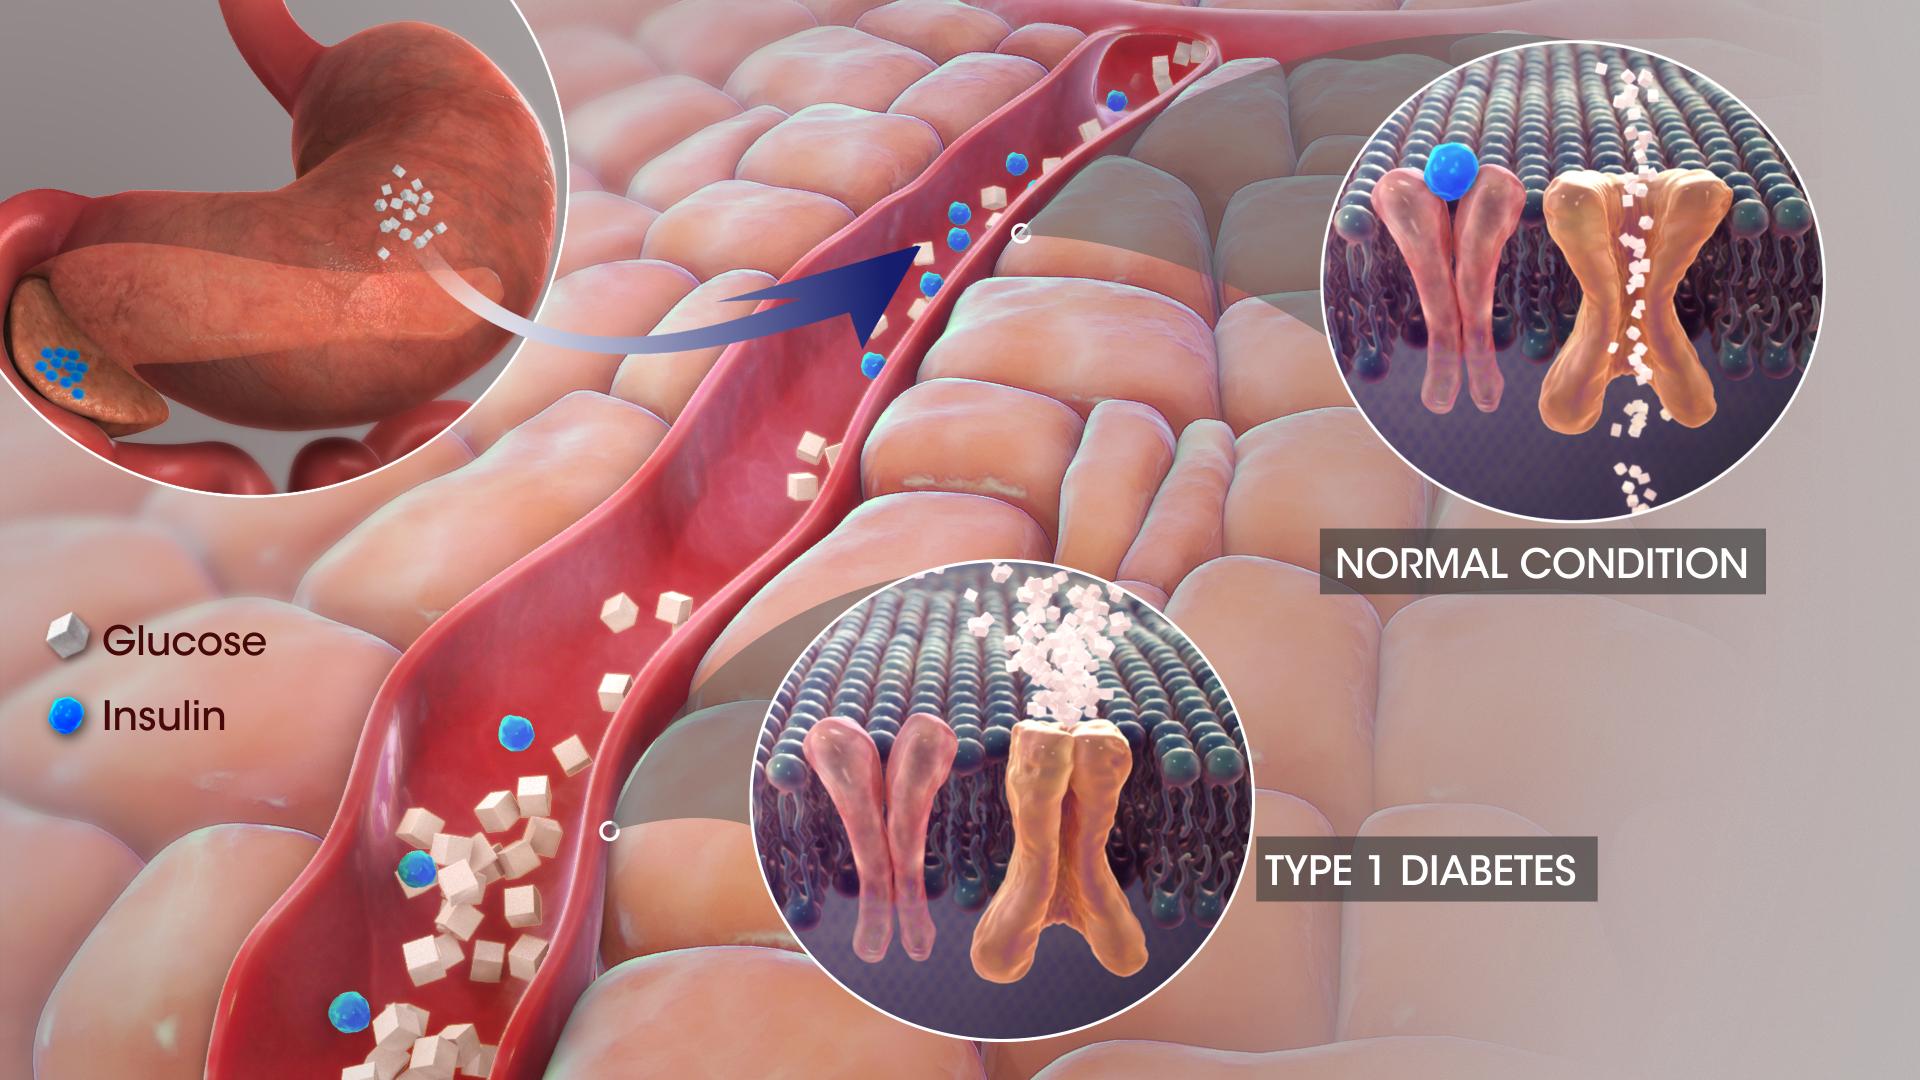 Diabetes: 3D Illustration